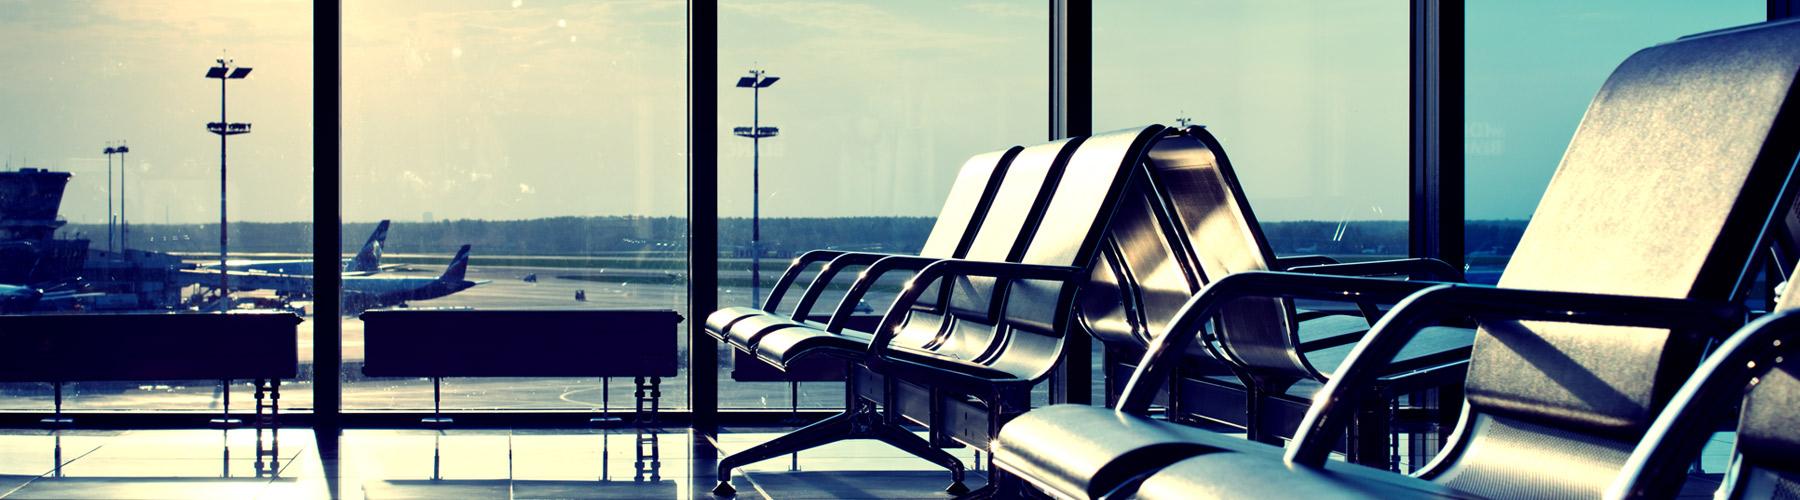 Custom Airport Graphics